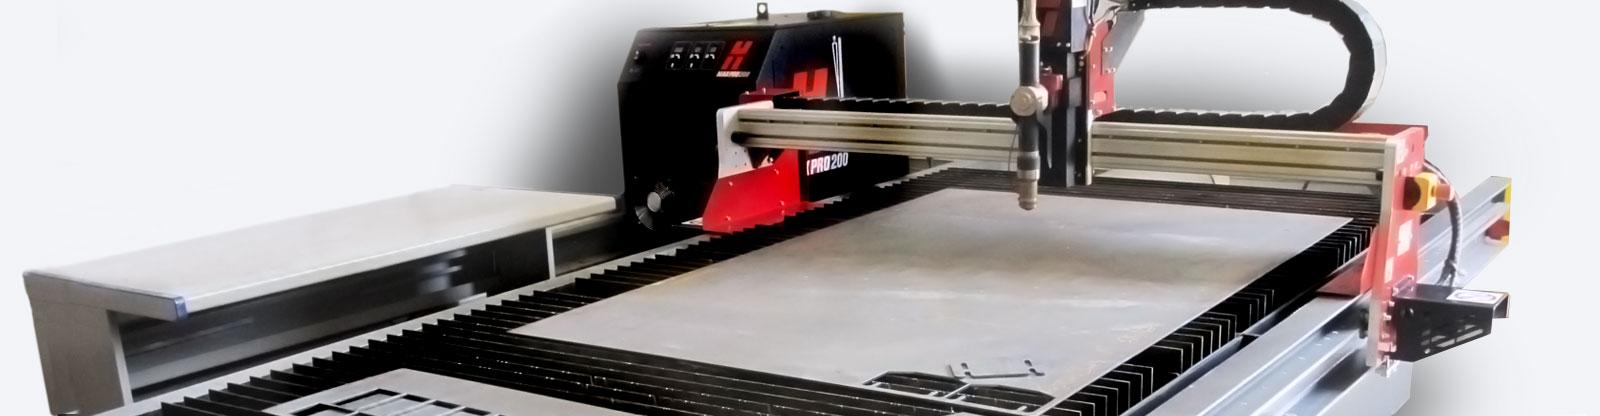 Firecut lite - CNC plasma cutter